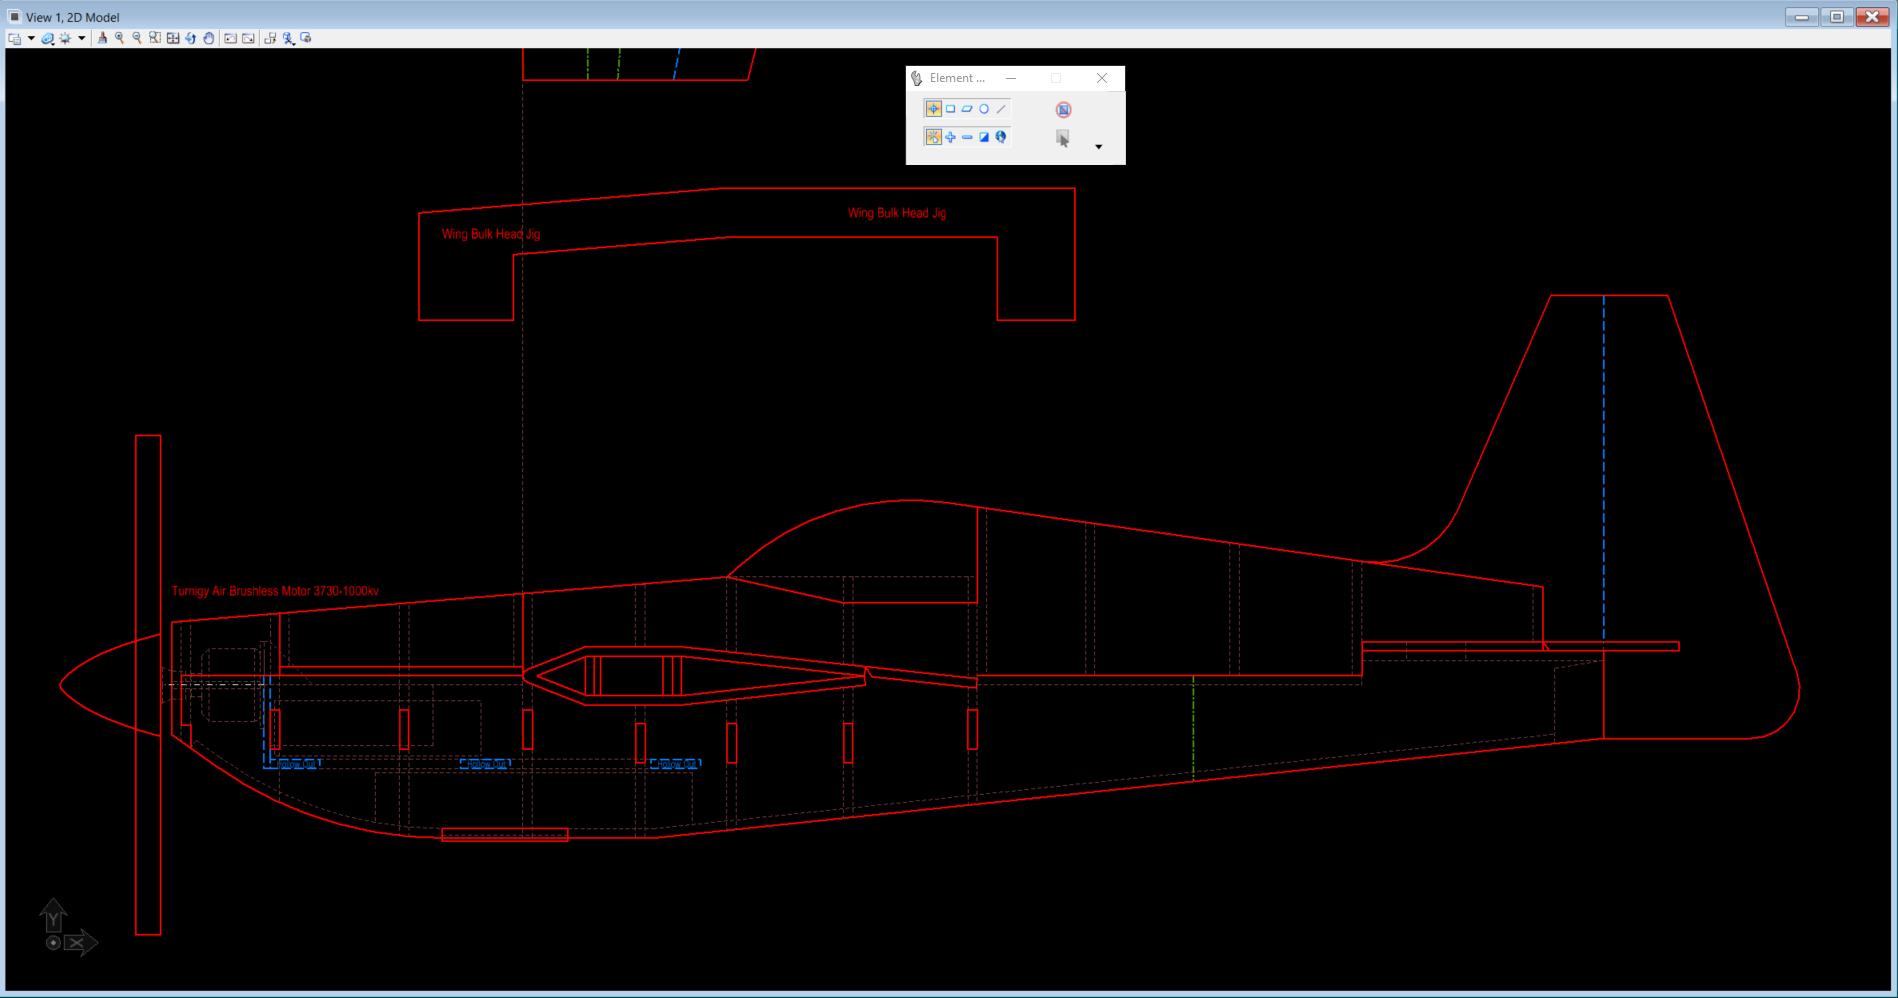 Edge 540 Plans And 3d Model Flitetest Forum Brushlessmotordiagrampng Edge540 14